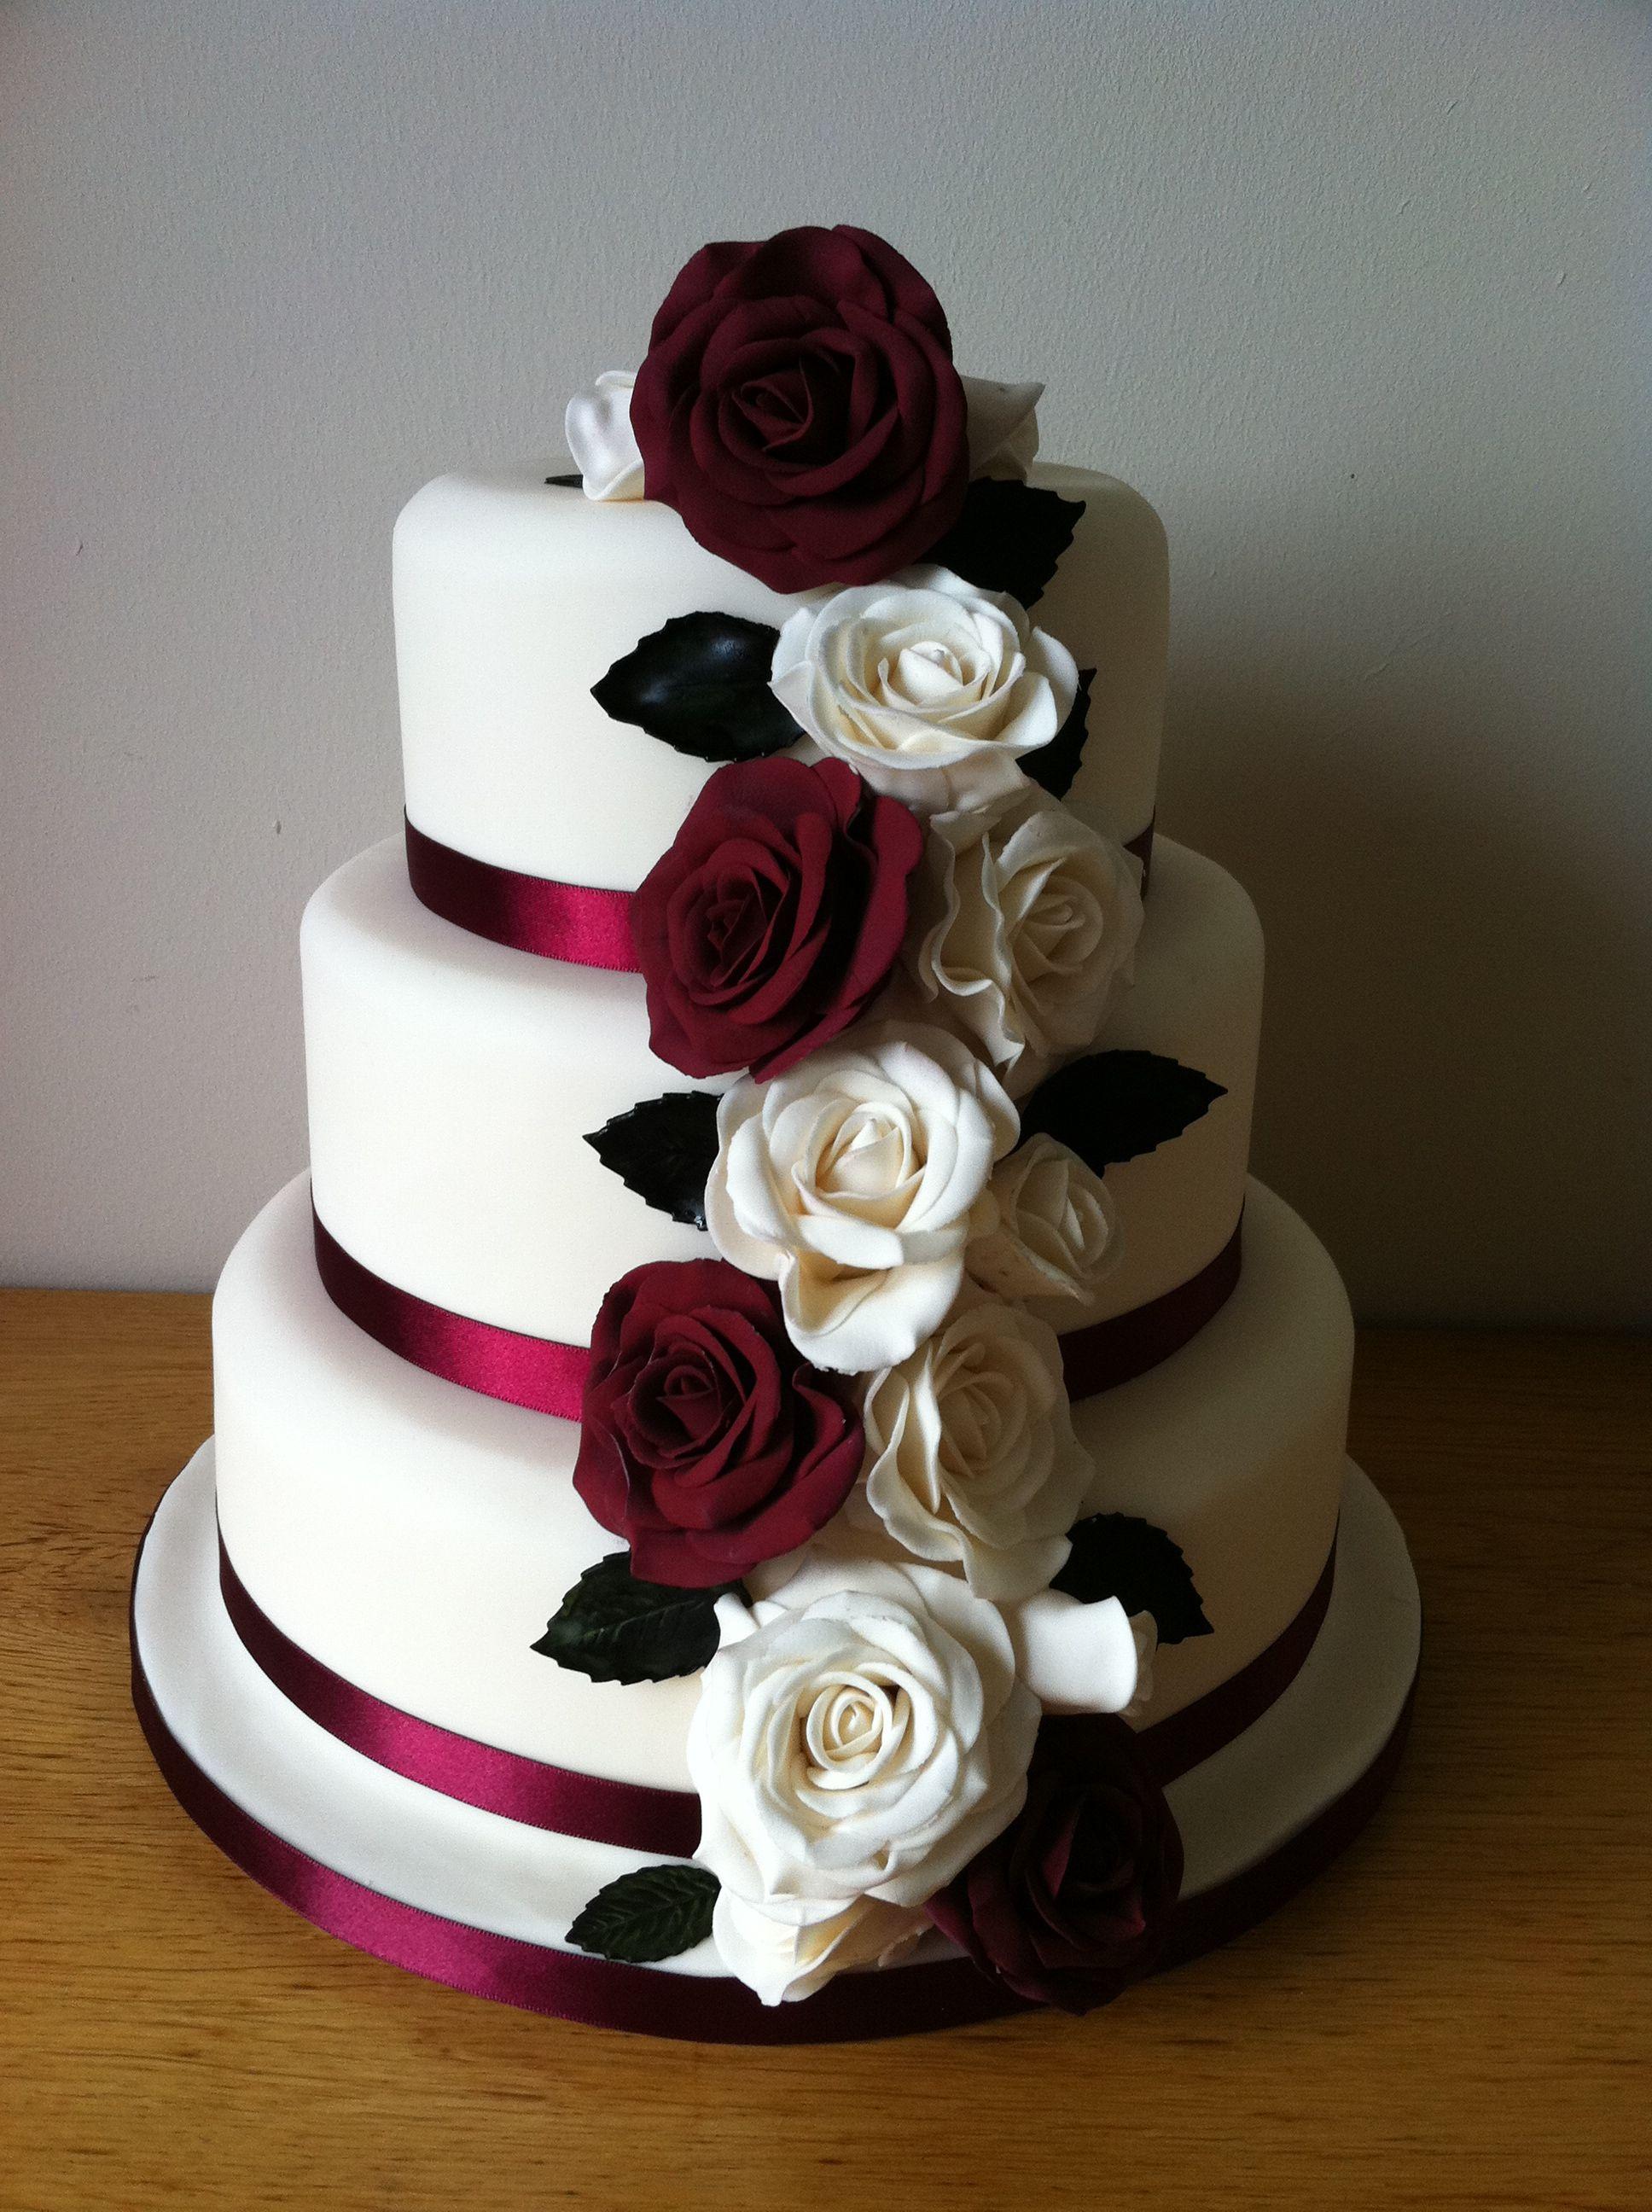 Love Wedding Cakes Burgandy And Ivory Rose Cake